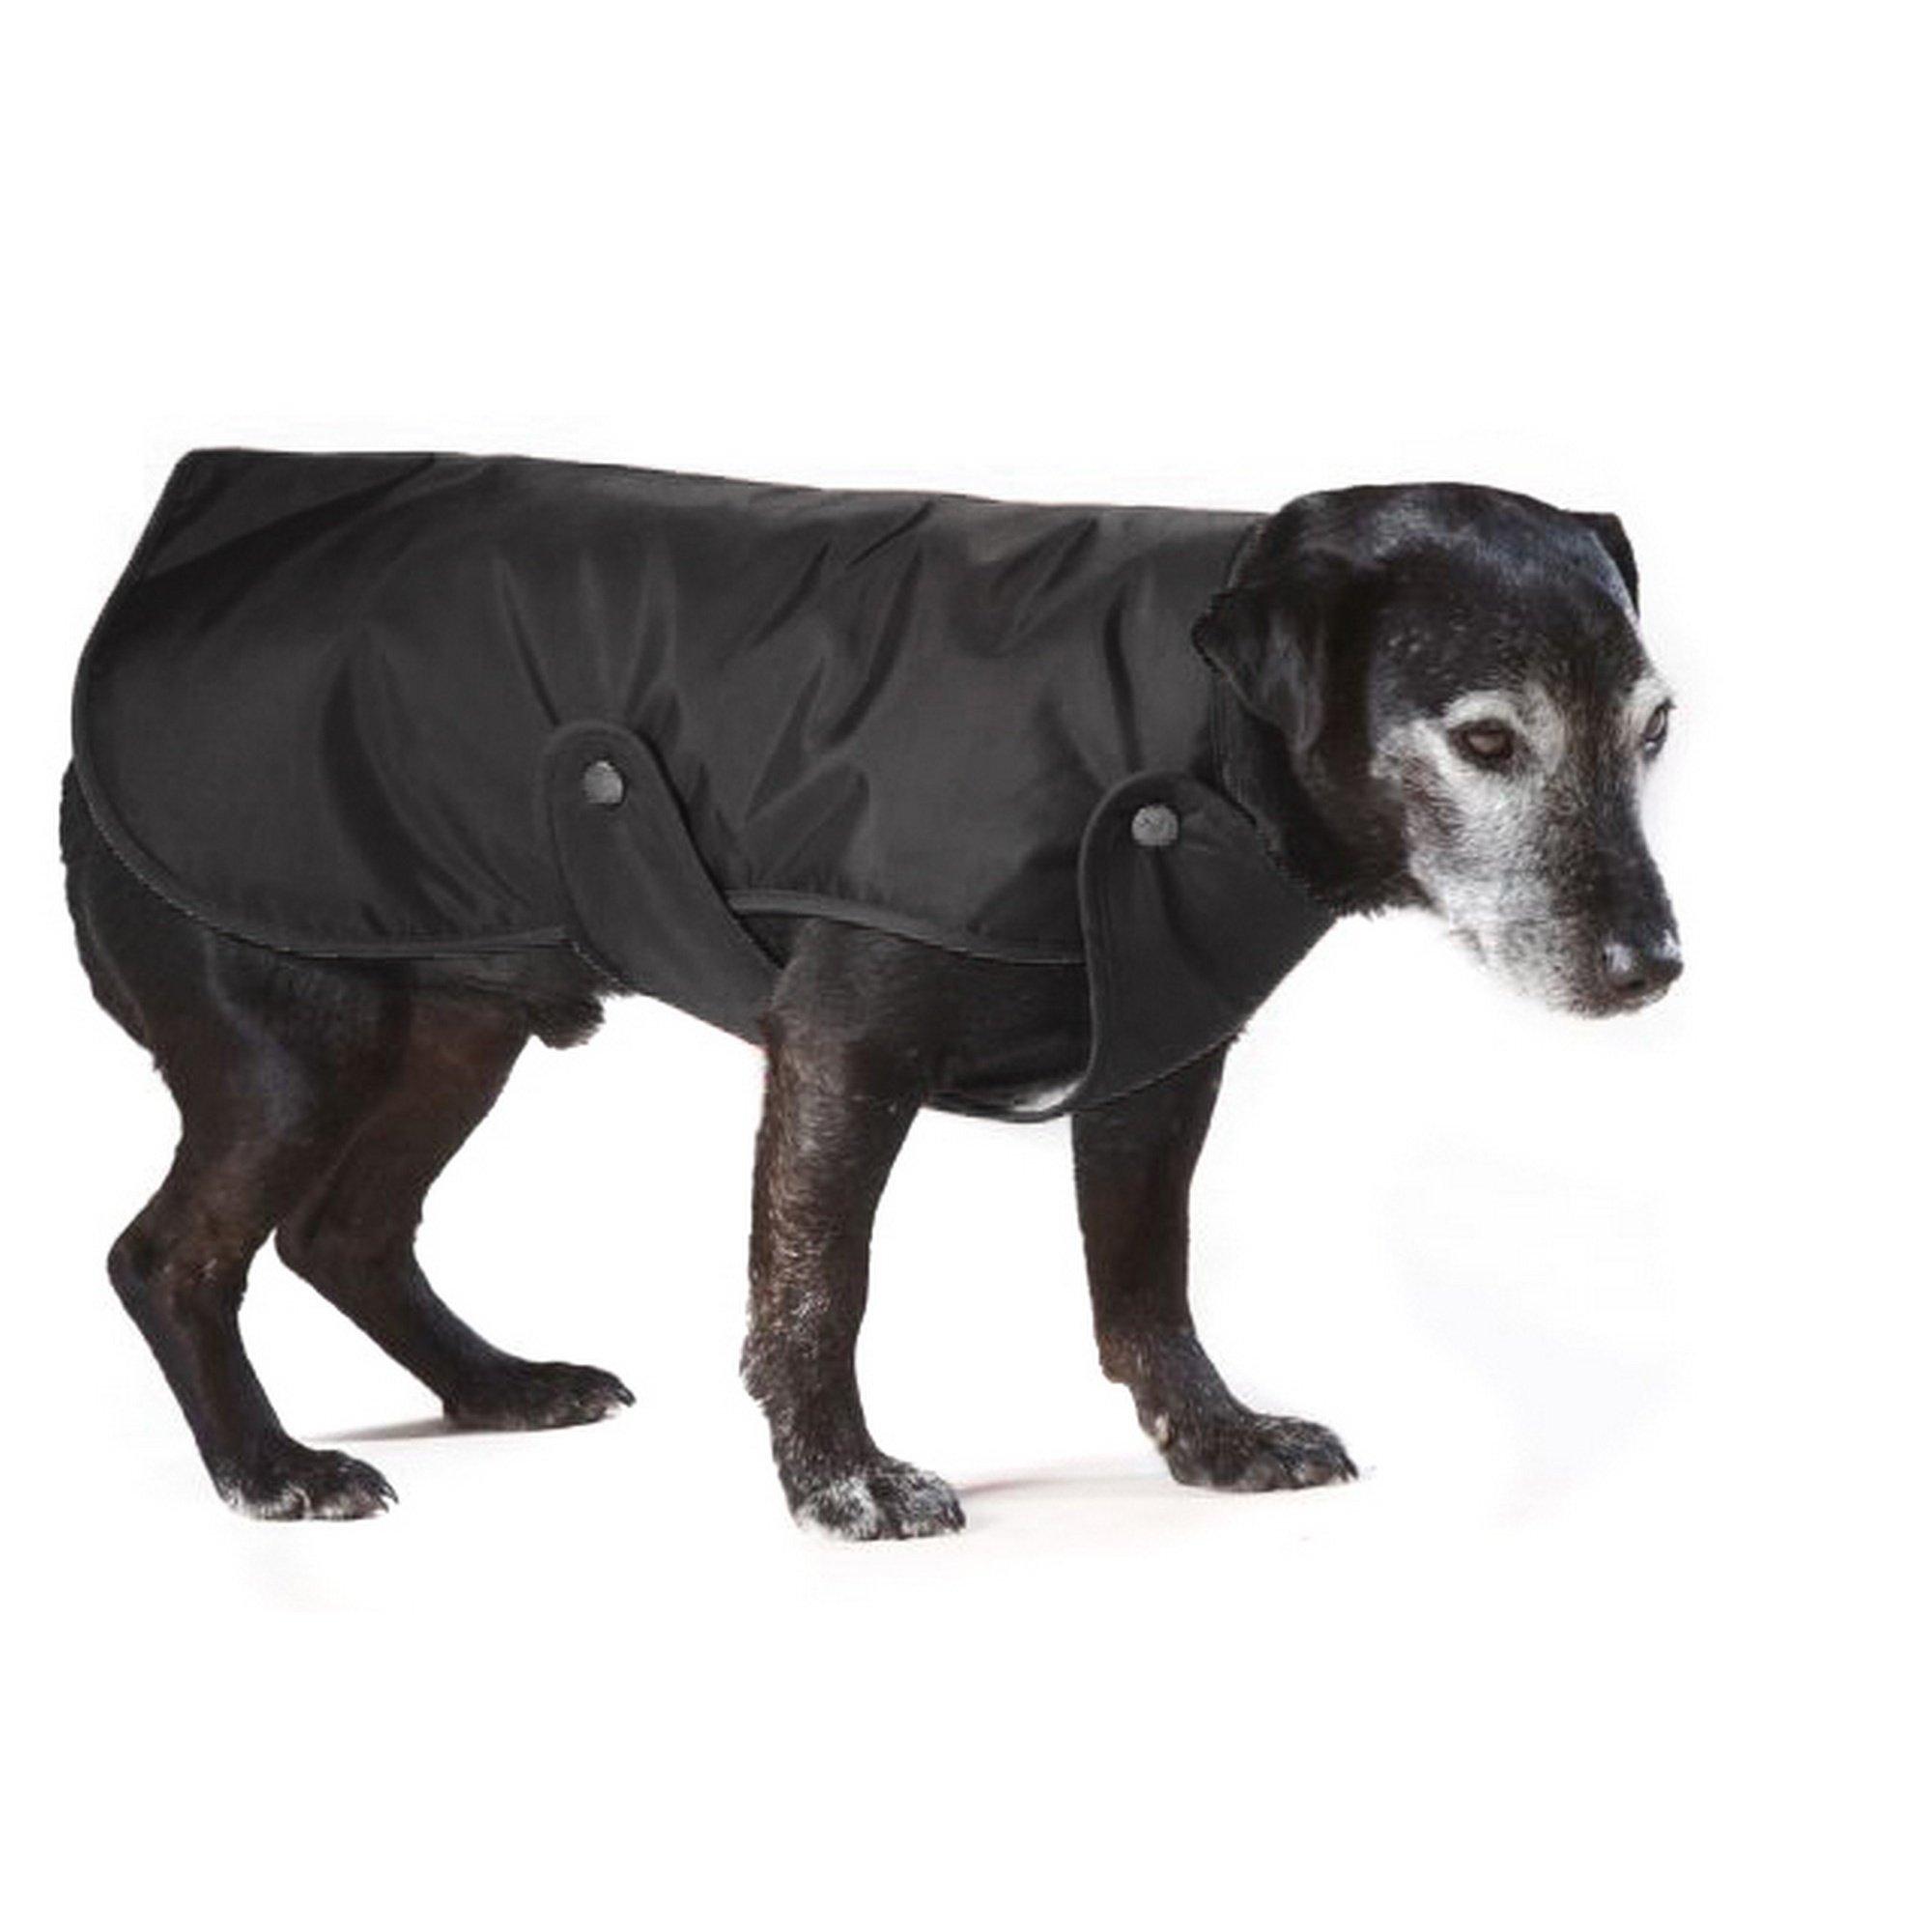 Cosipet Lined Dog Rain Coat (8in) (Black)